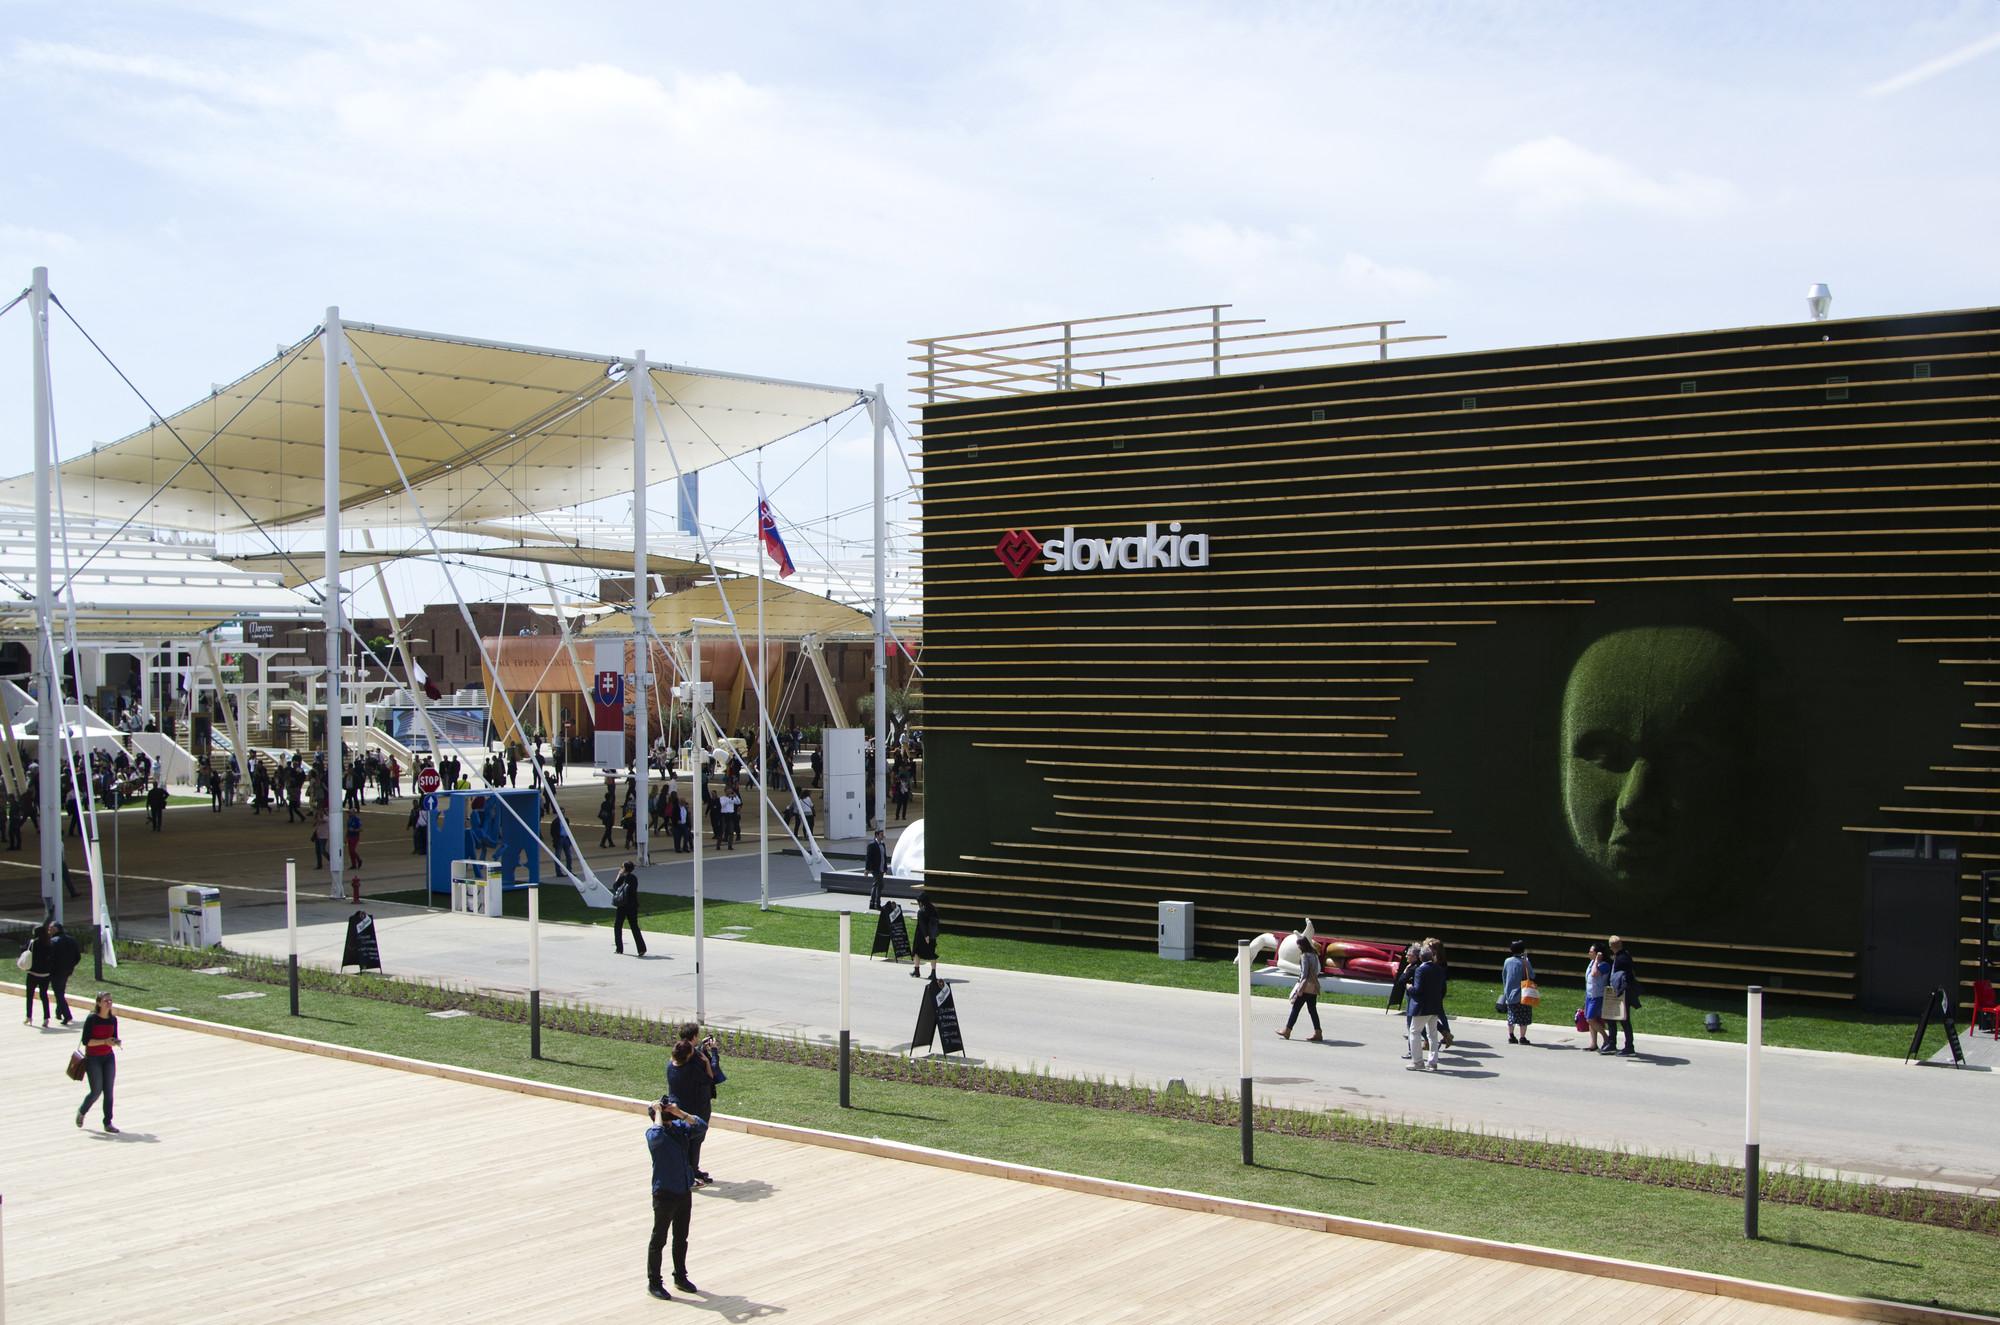 Tour Guiado por la Expo Milán 2015